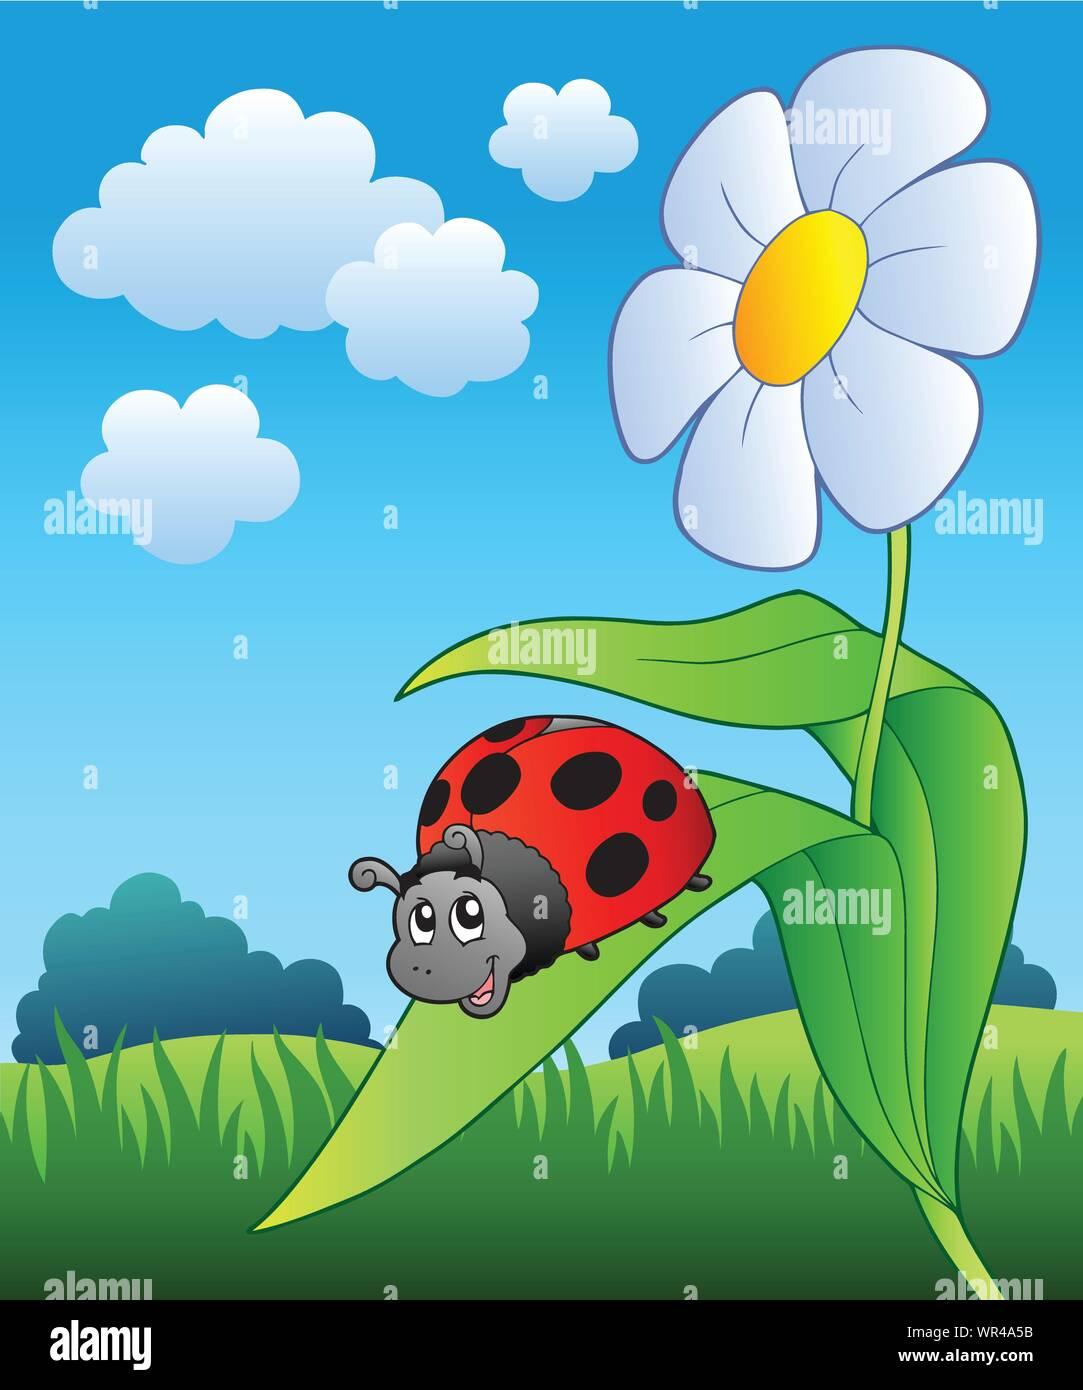 Ladybug On A Flower : ladybug, flower, Ladybug, Flower, Stock, Vector, Image, Alamy